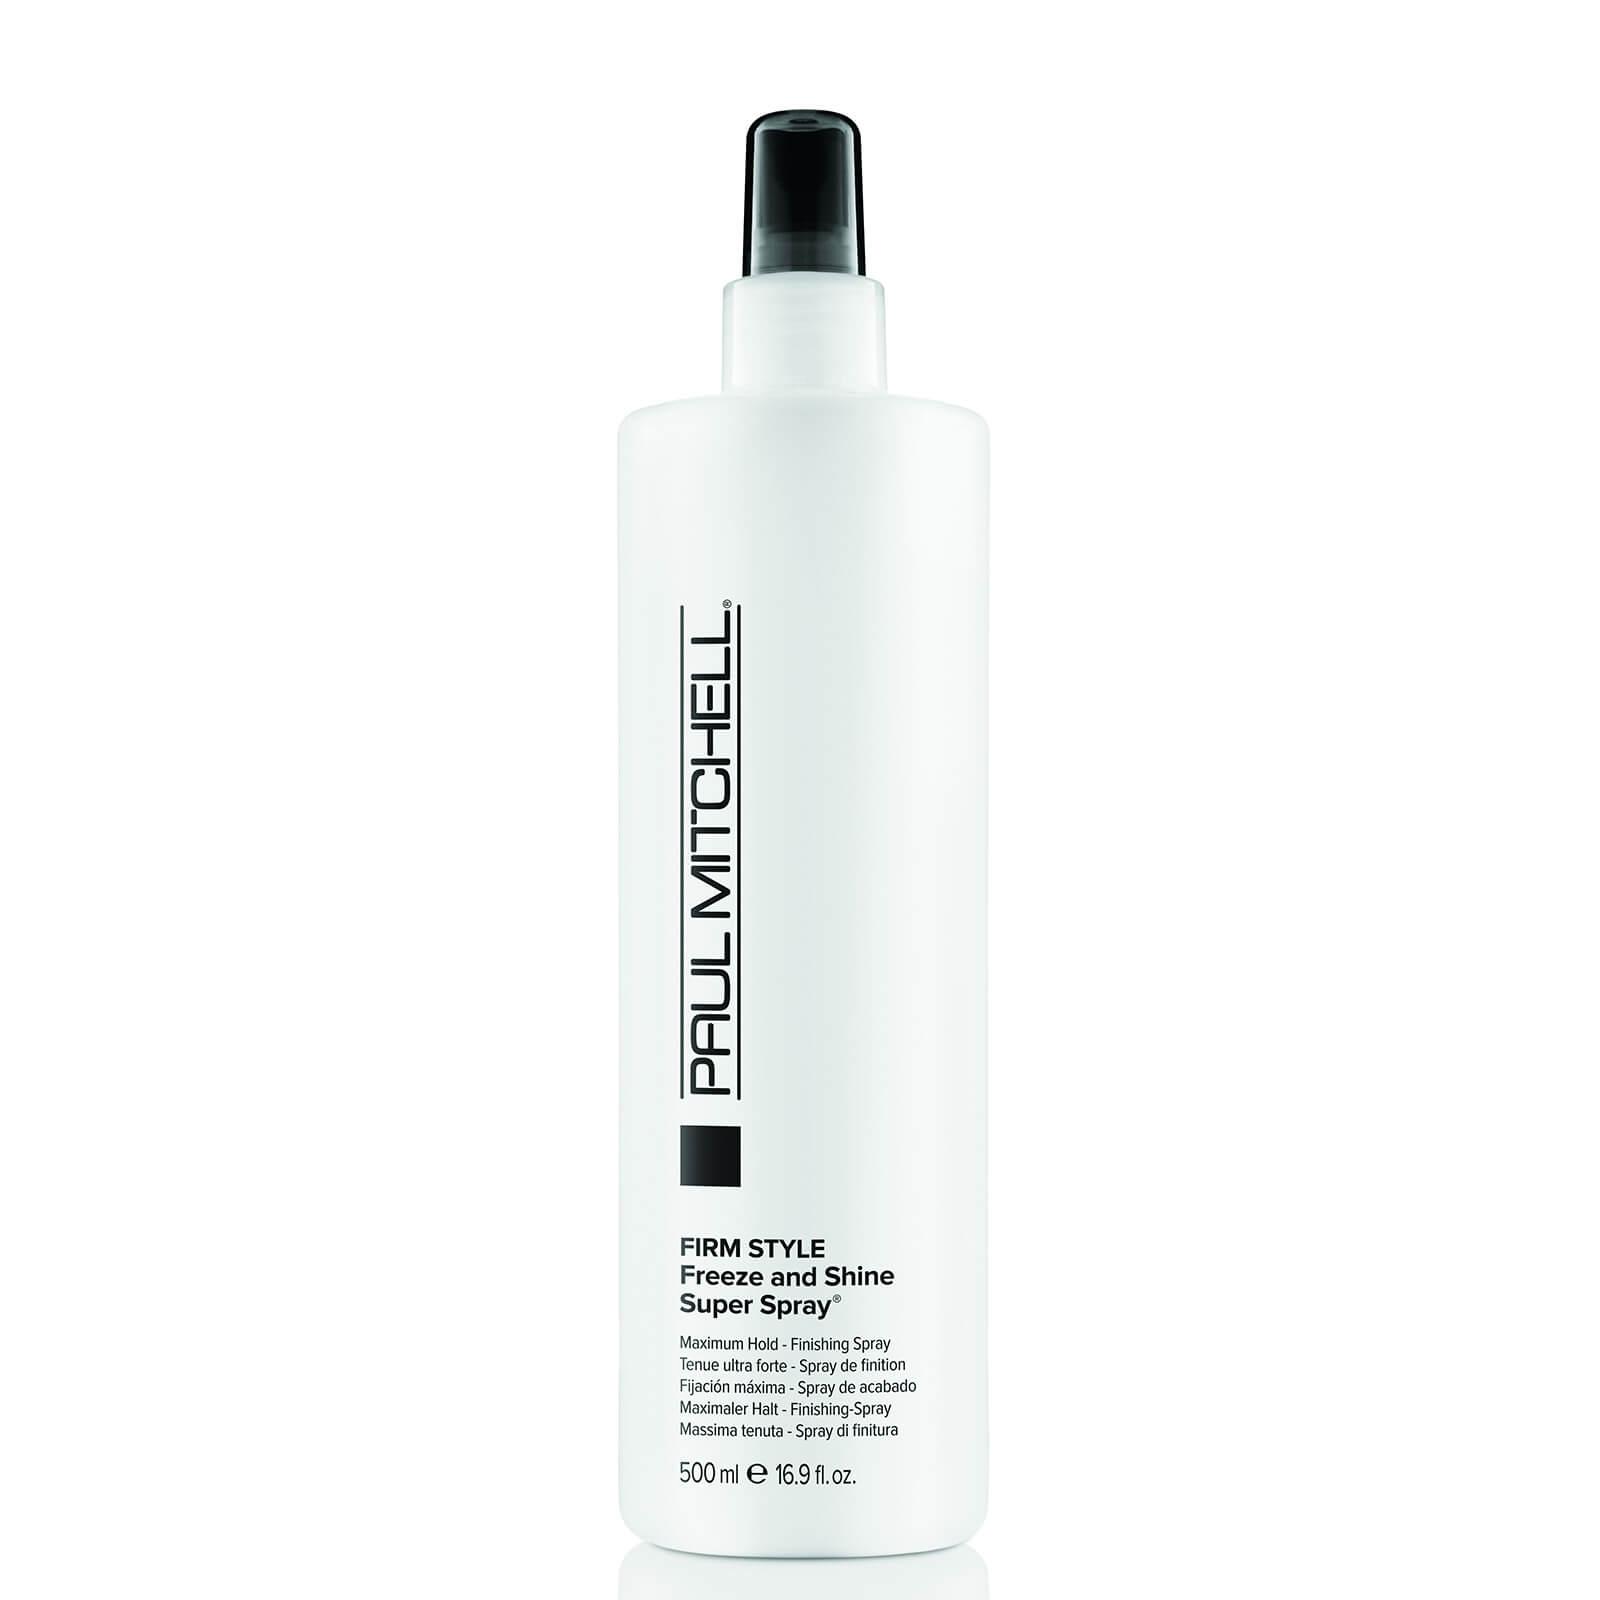 Купить Paul Mitchell Firm Style Freeze And Shine Super Spray (500ml)